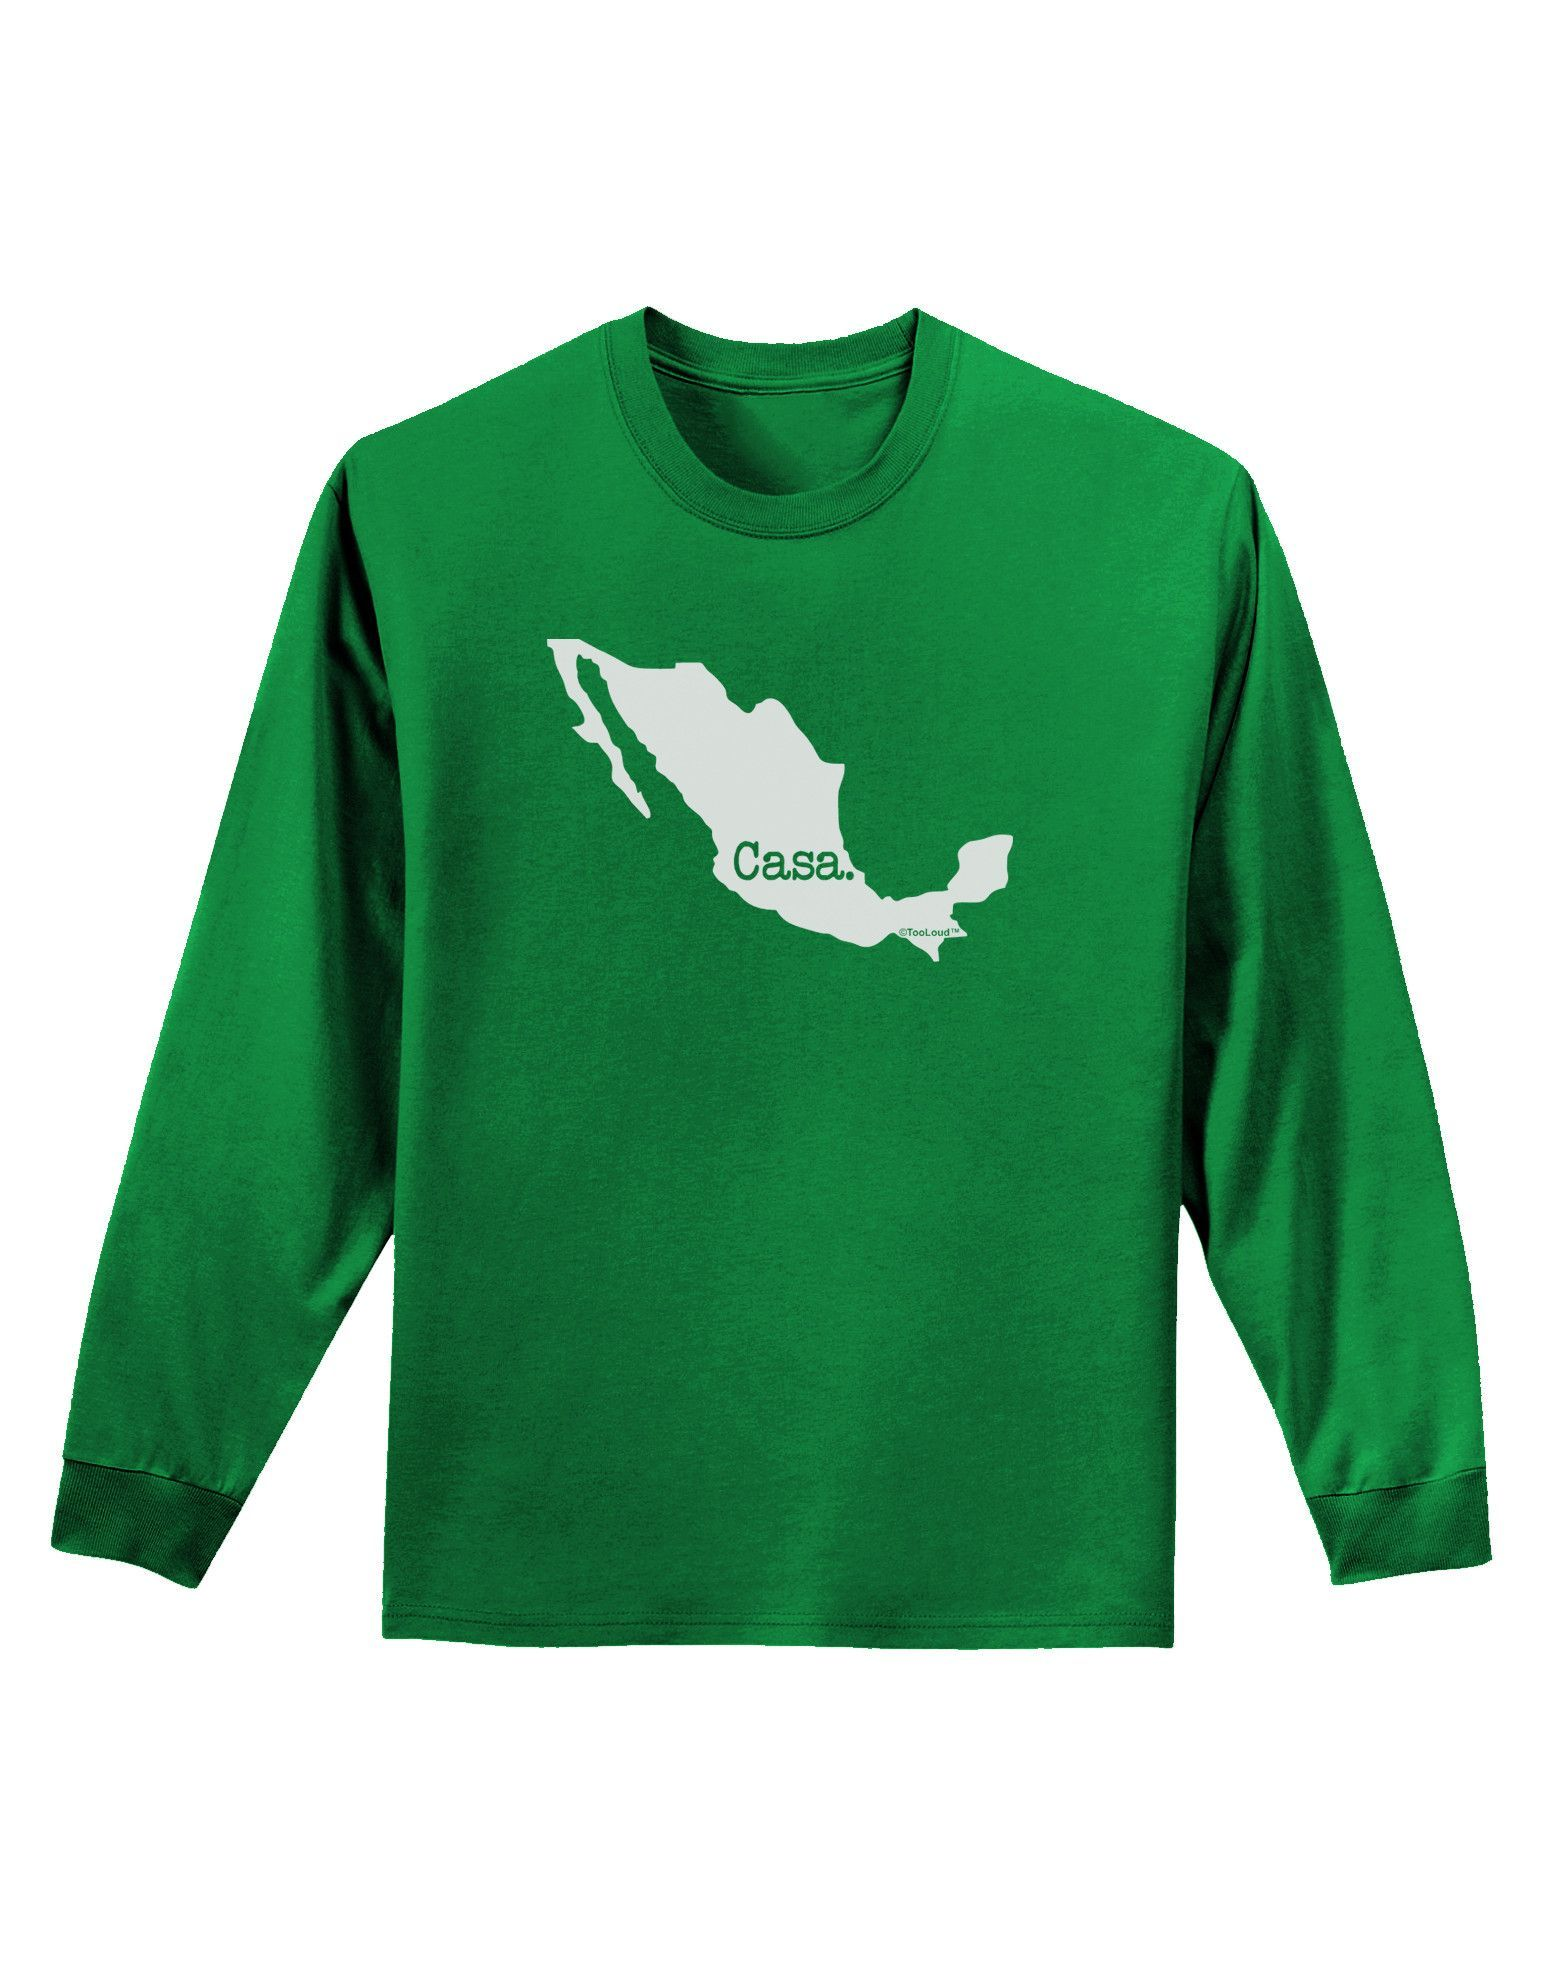 TooLoud Mexico - Casa - Cinco De Mayo Adult Long Sleeve Dark T-Shirt